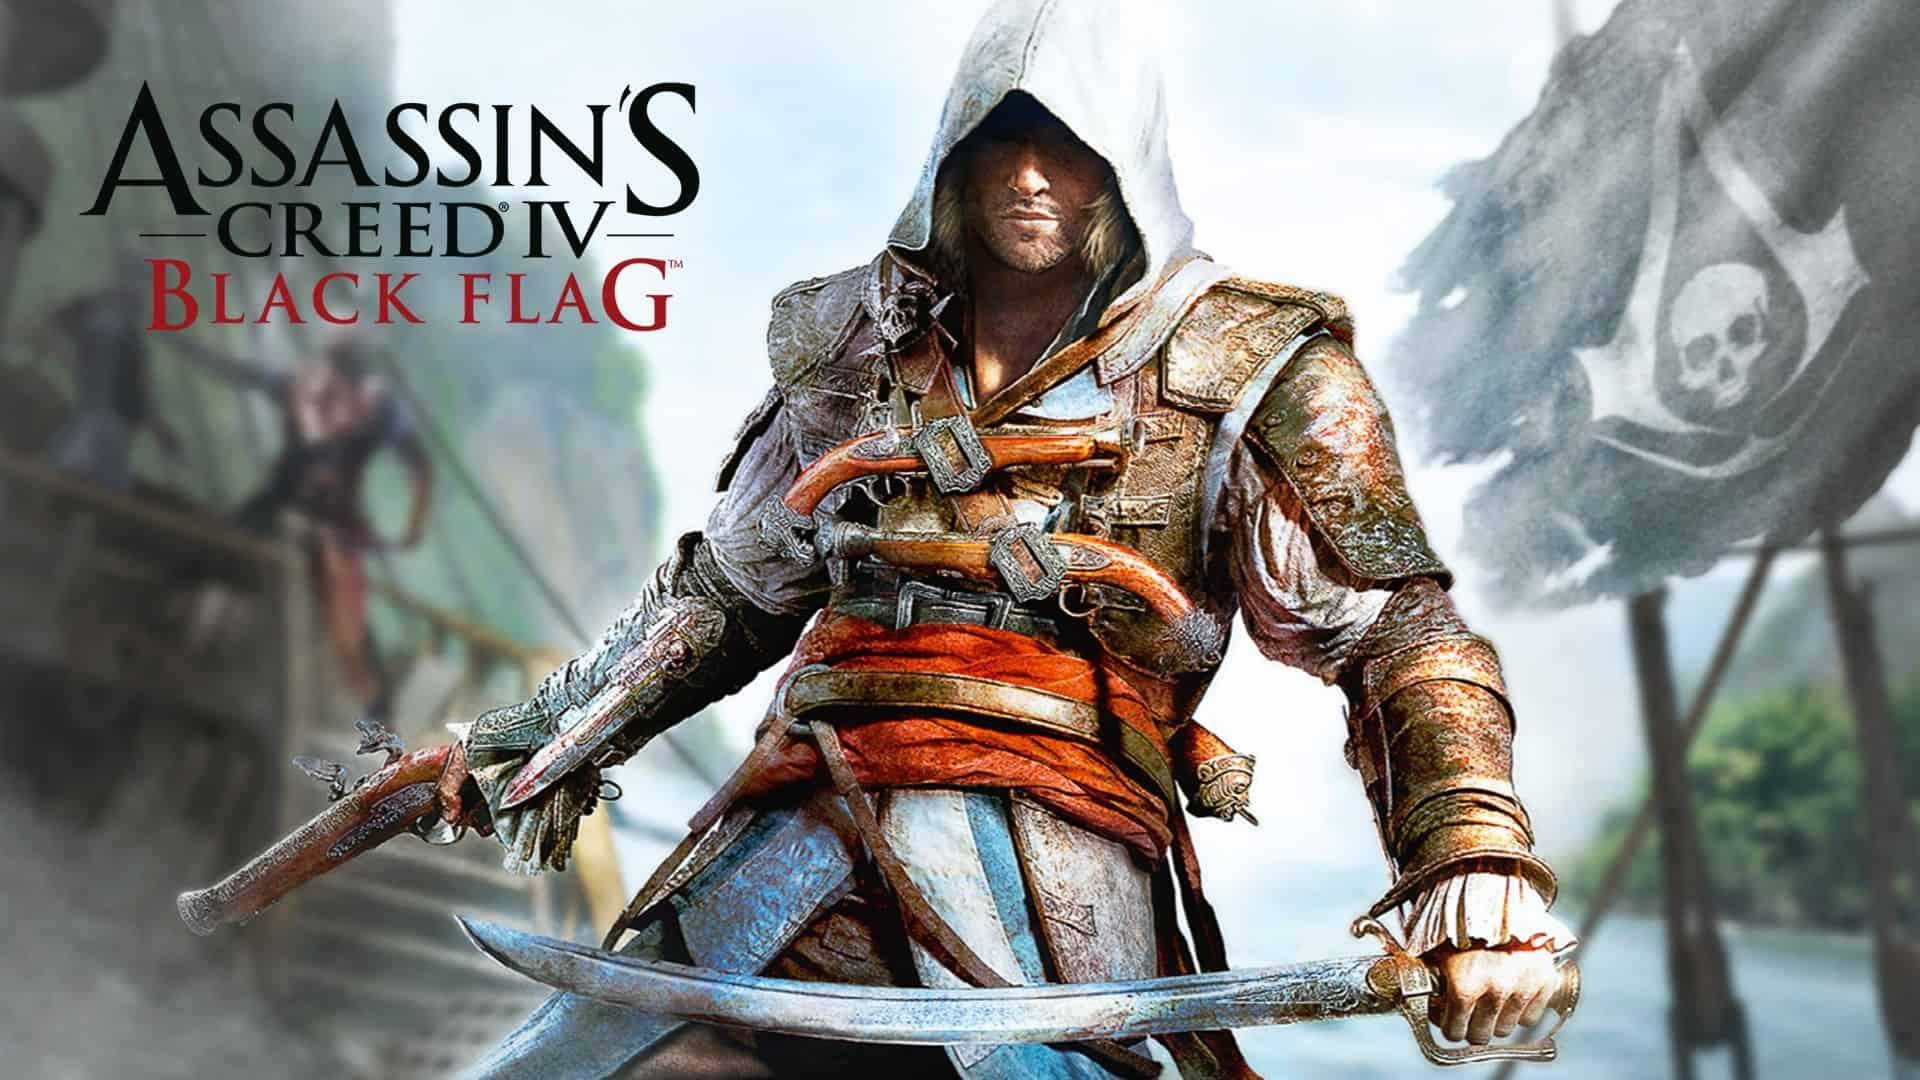 Best Assassins Creed Games - Assassins Creed IV Black Flag